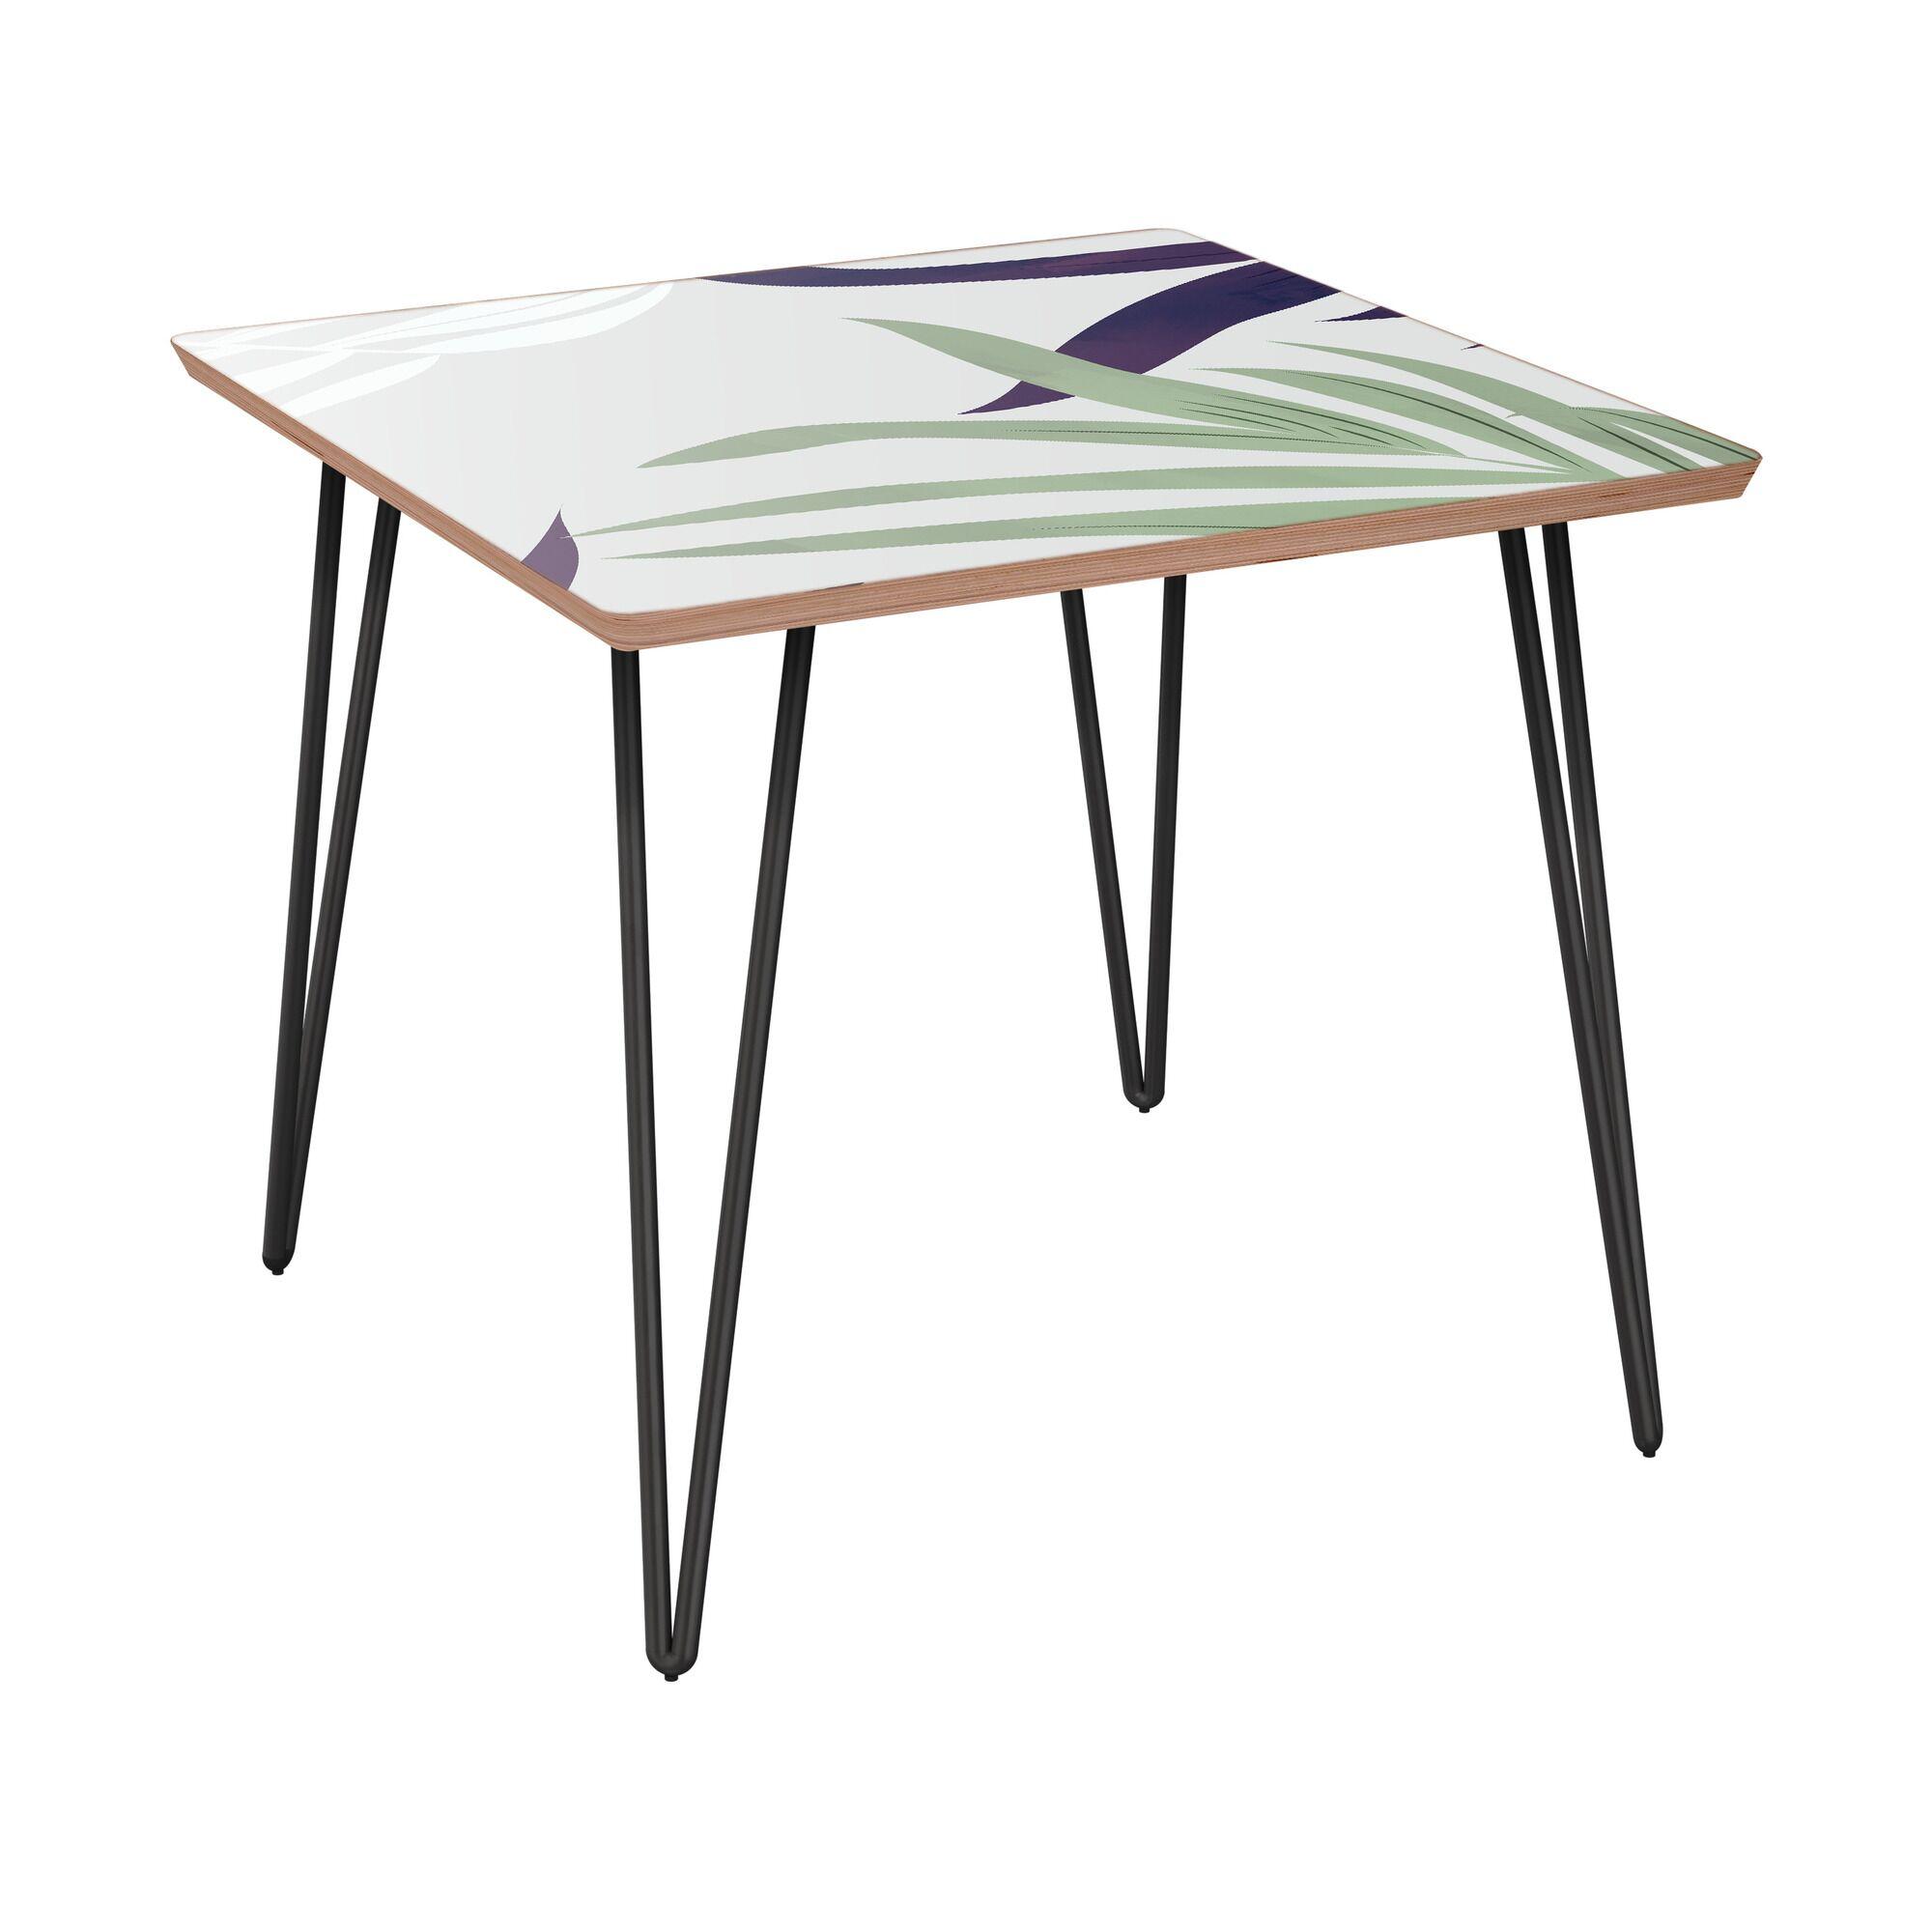 Jannie End Table Table Base Color: Black, Table Top Color: Walnut